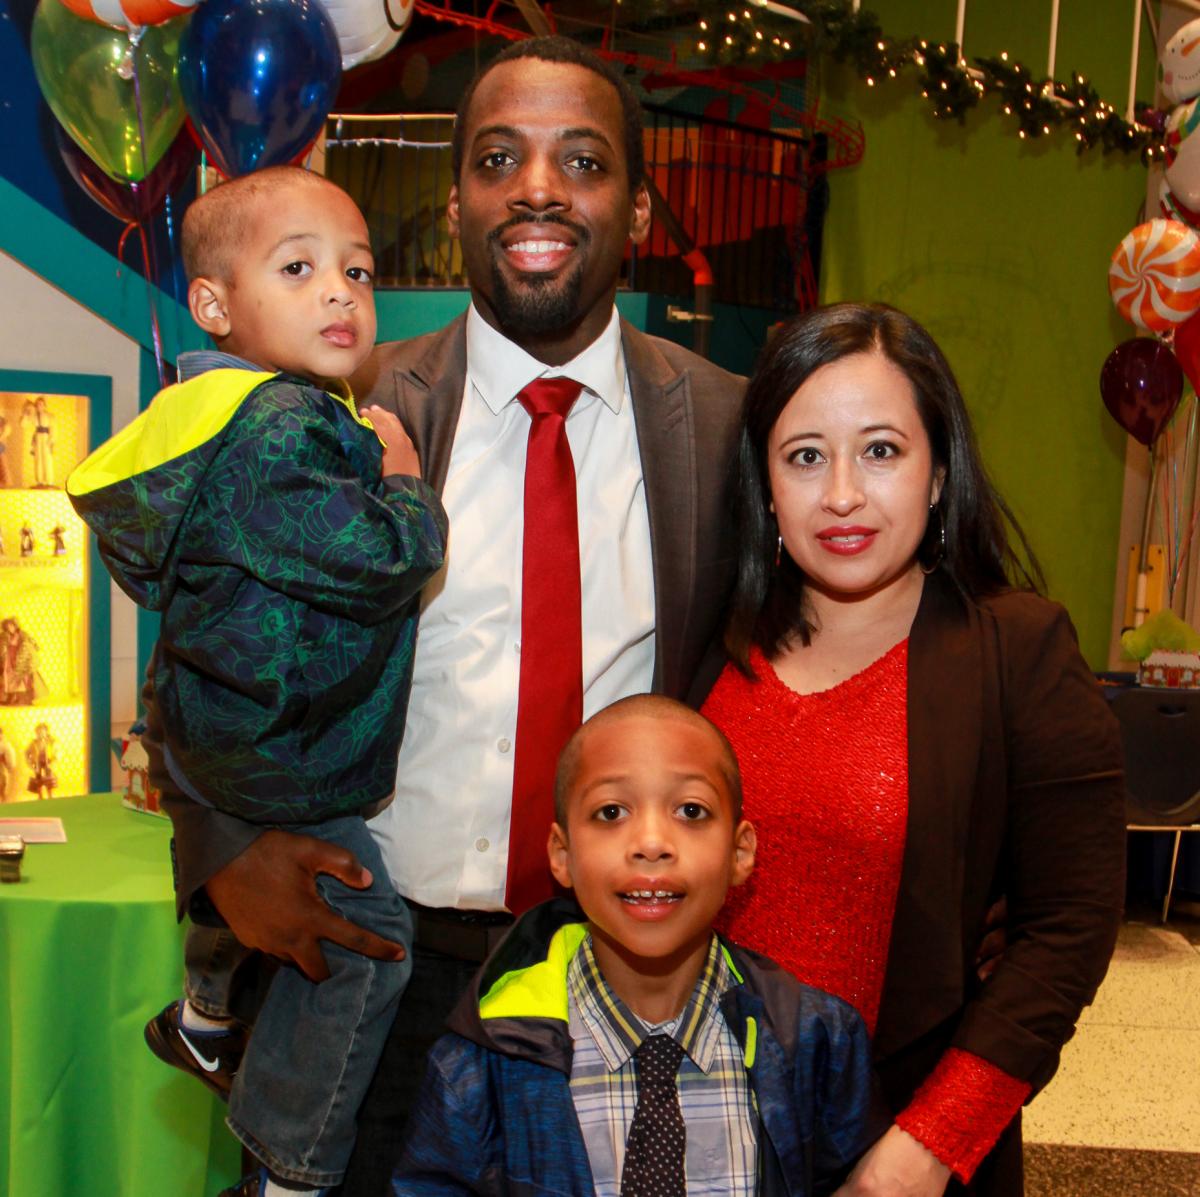 Children's Museum holiday party, Hakim Johnson, Araceli Johnson and children